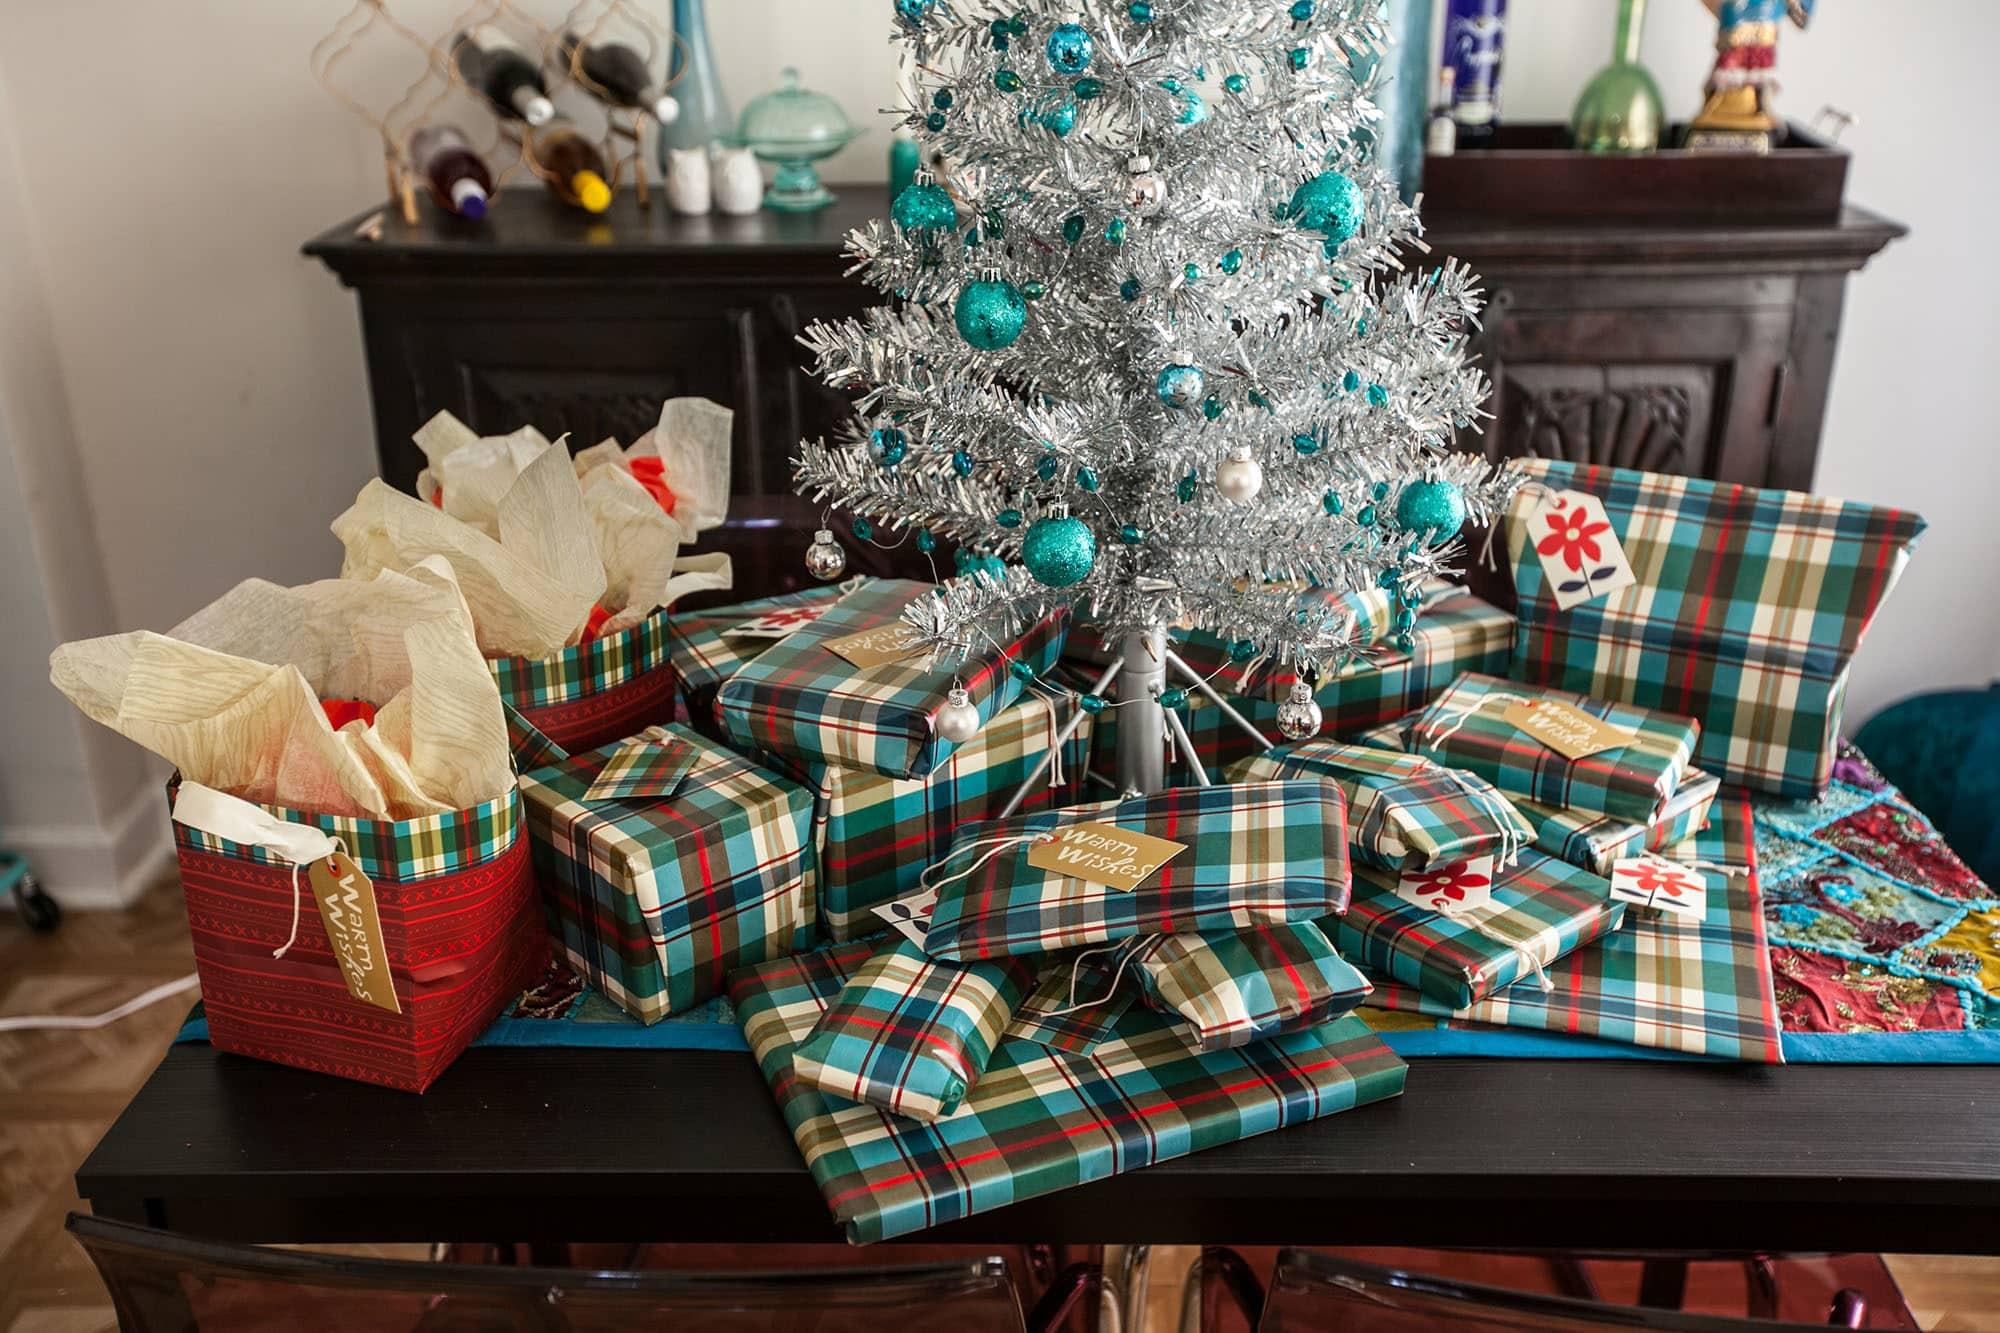 Christmas presents under my tree.